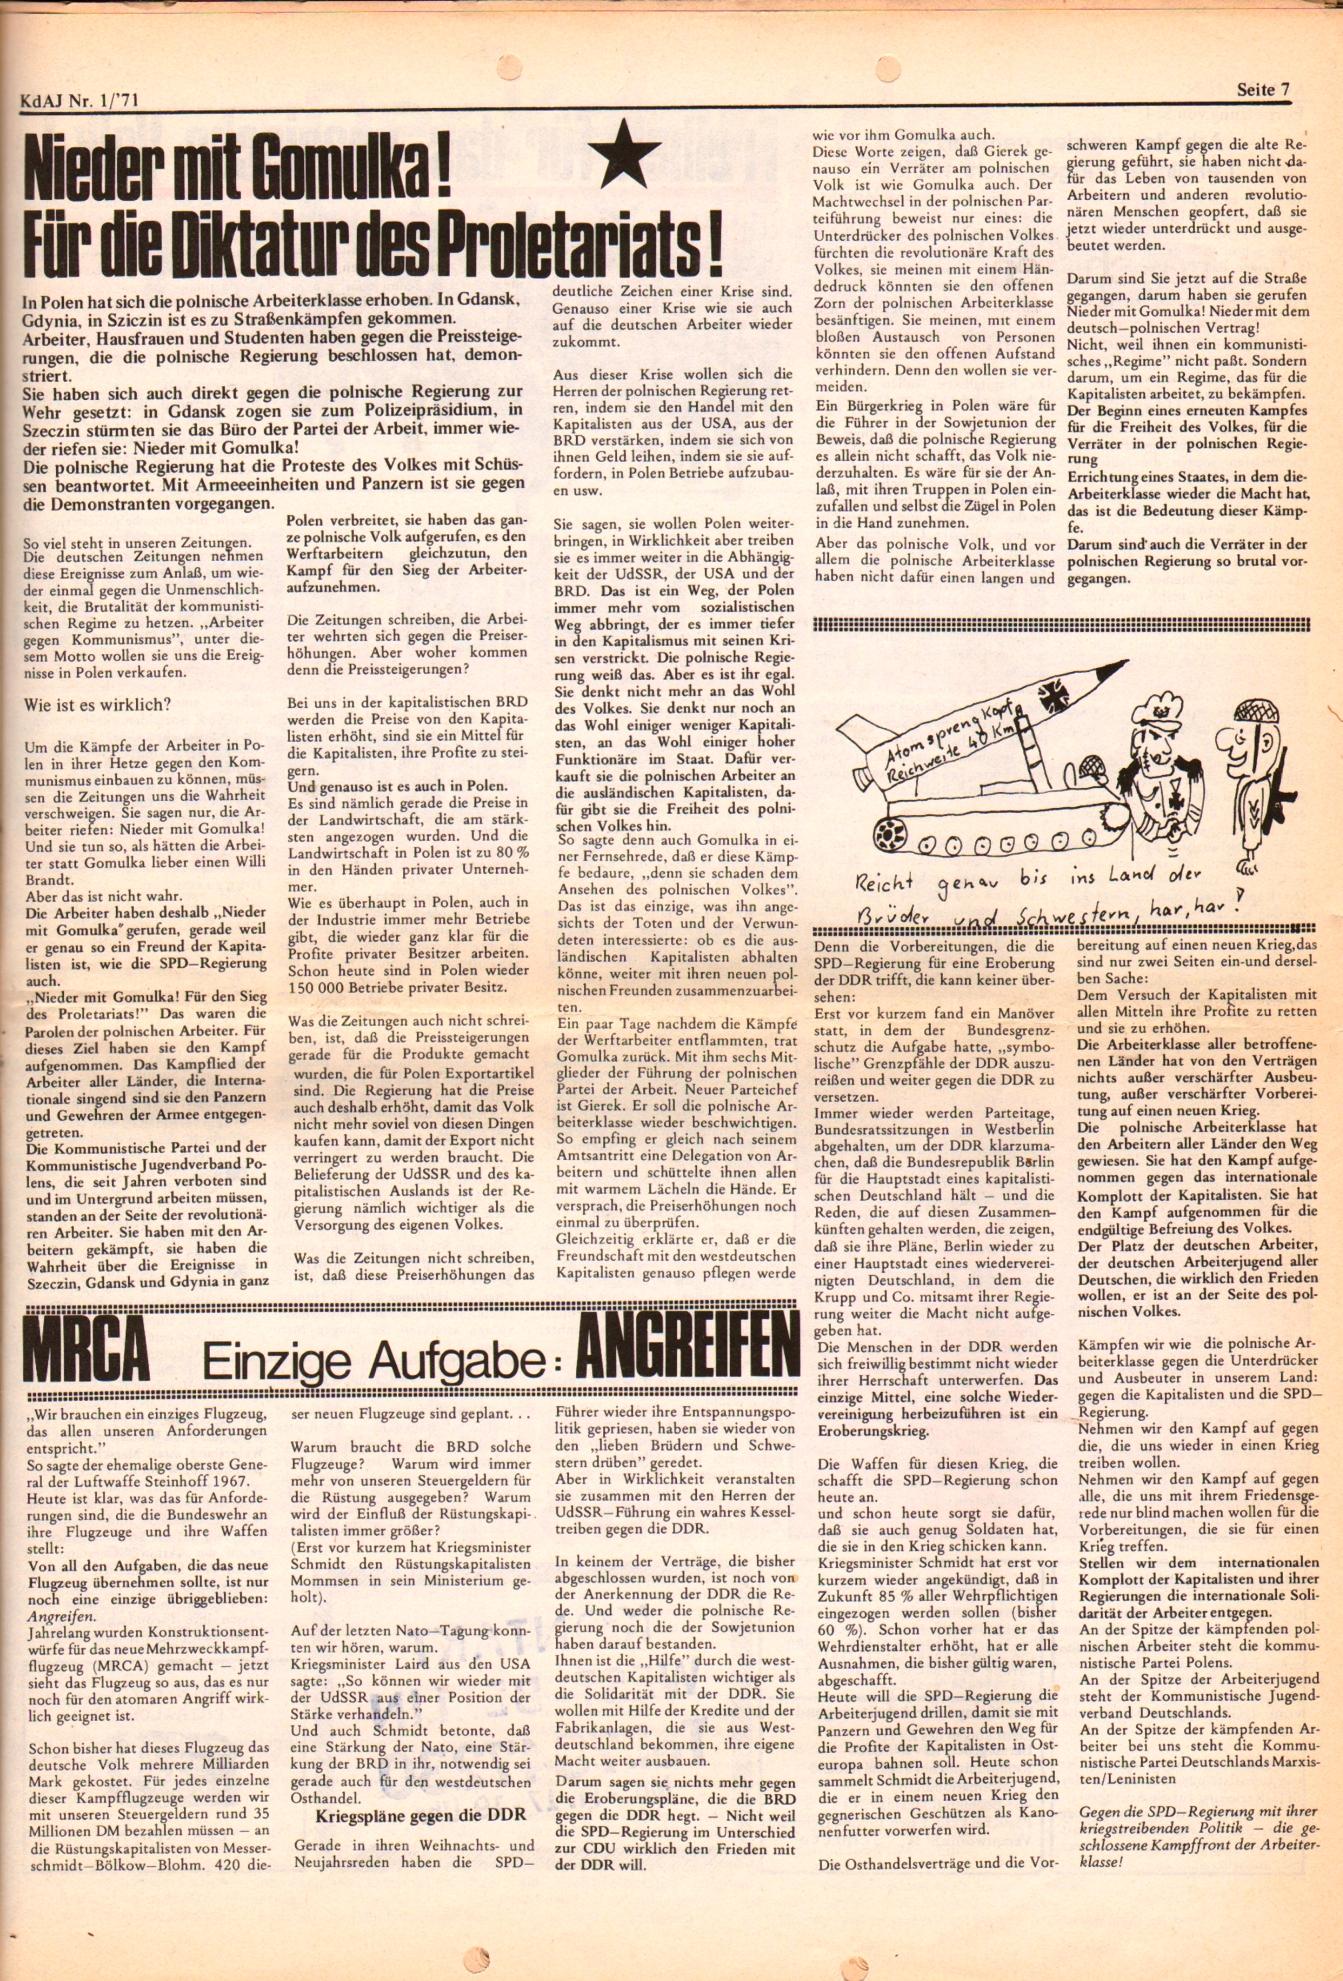 KDAJ, 2. Jg., Januar 1971, Nr. 1, Seite 7